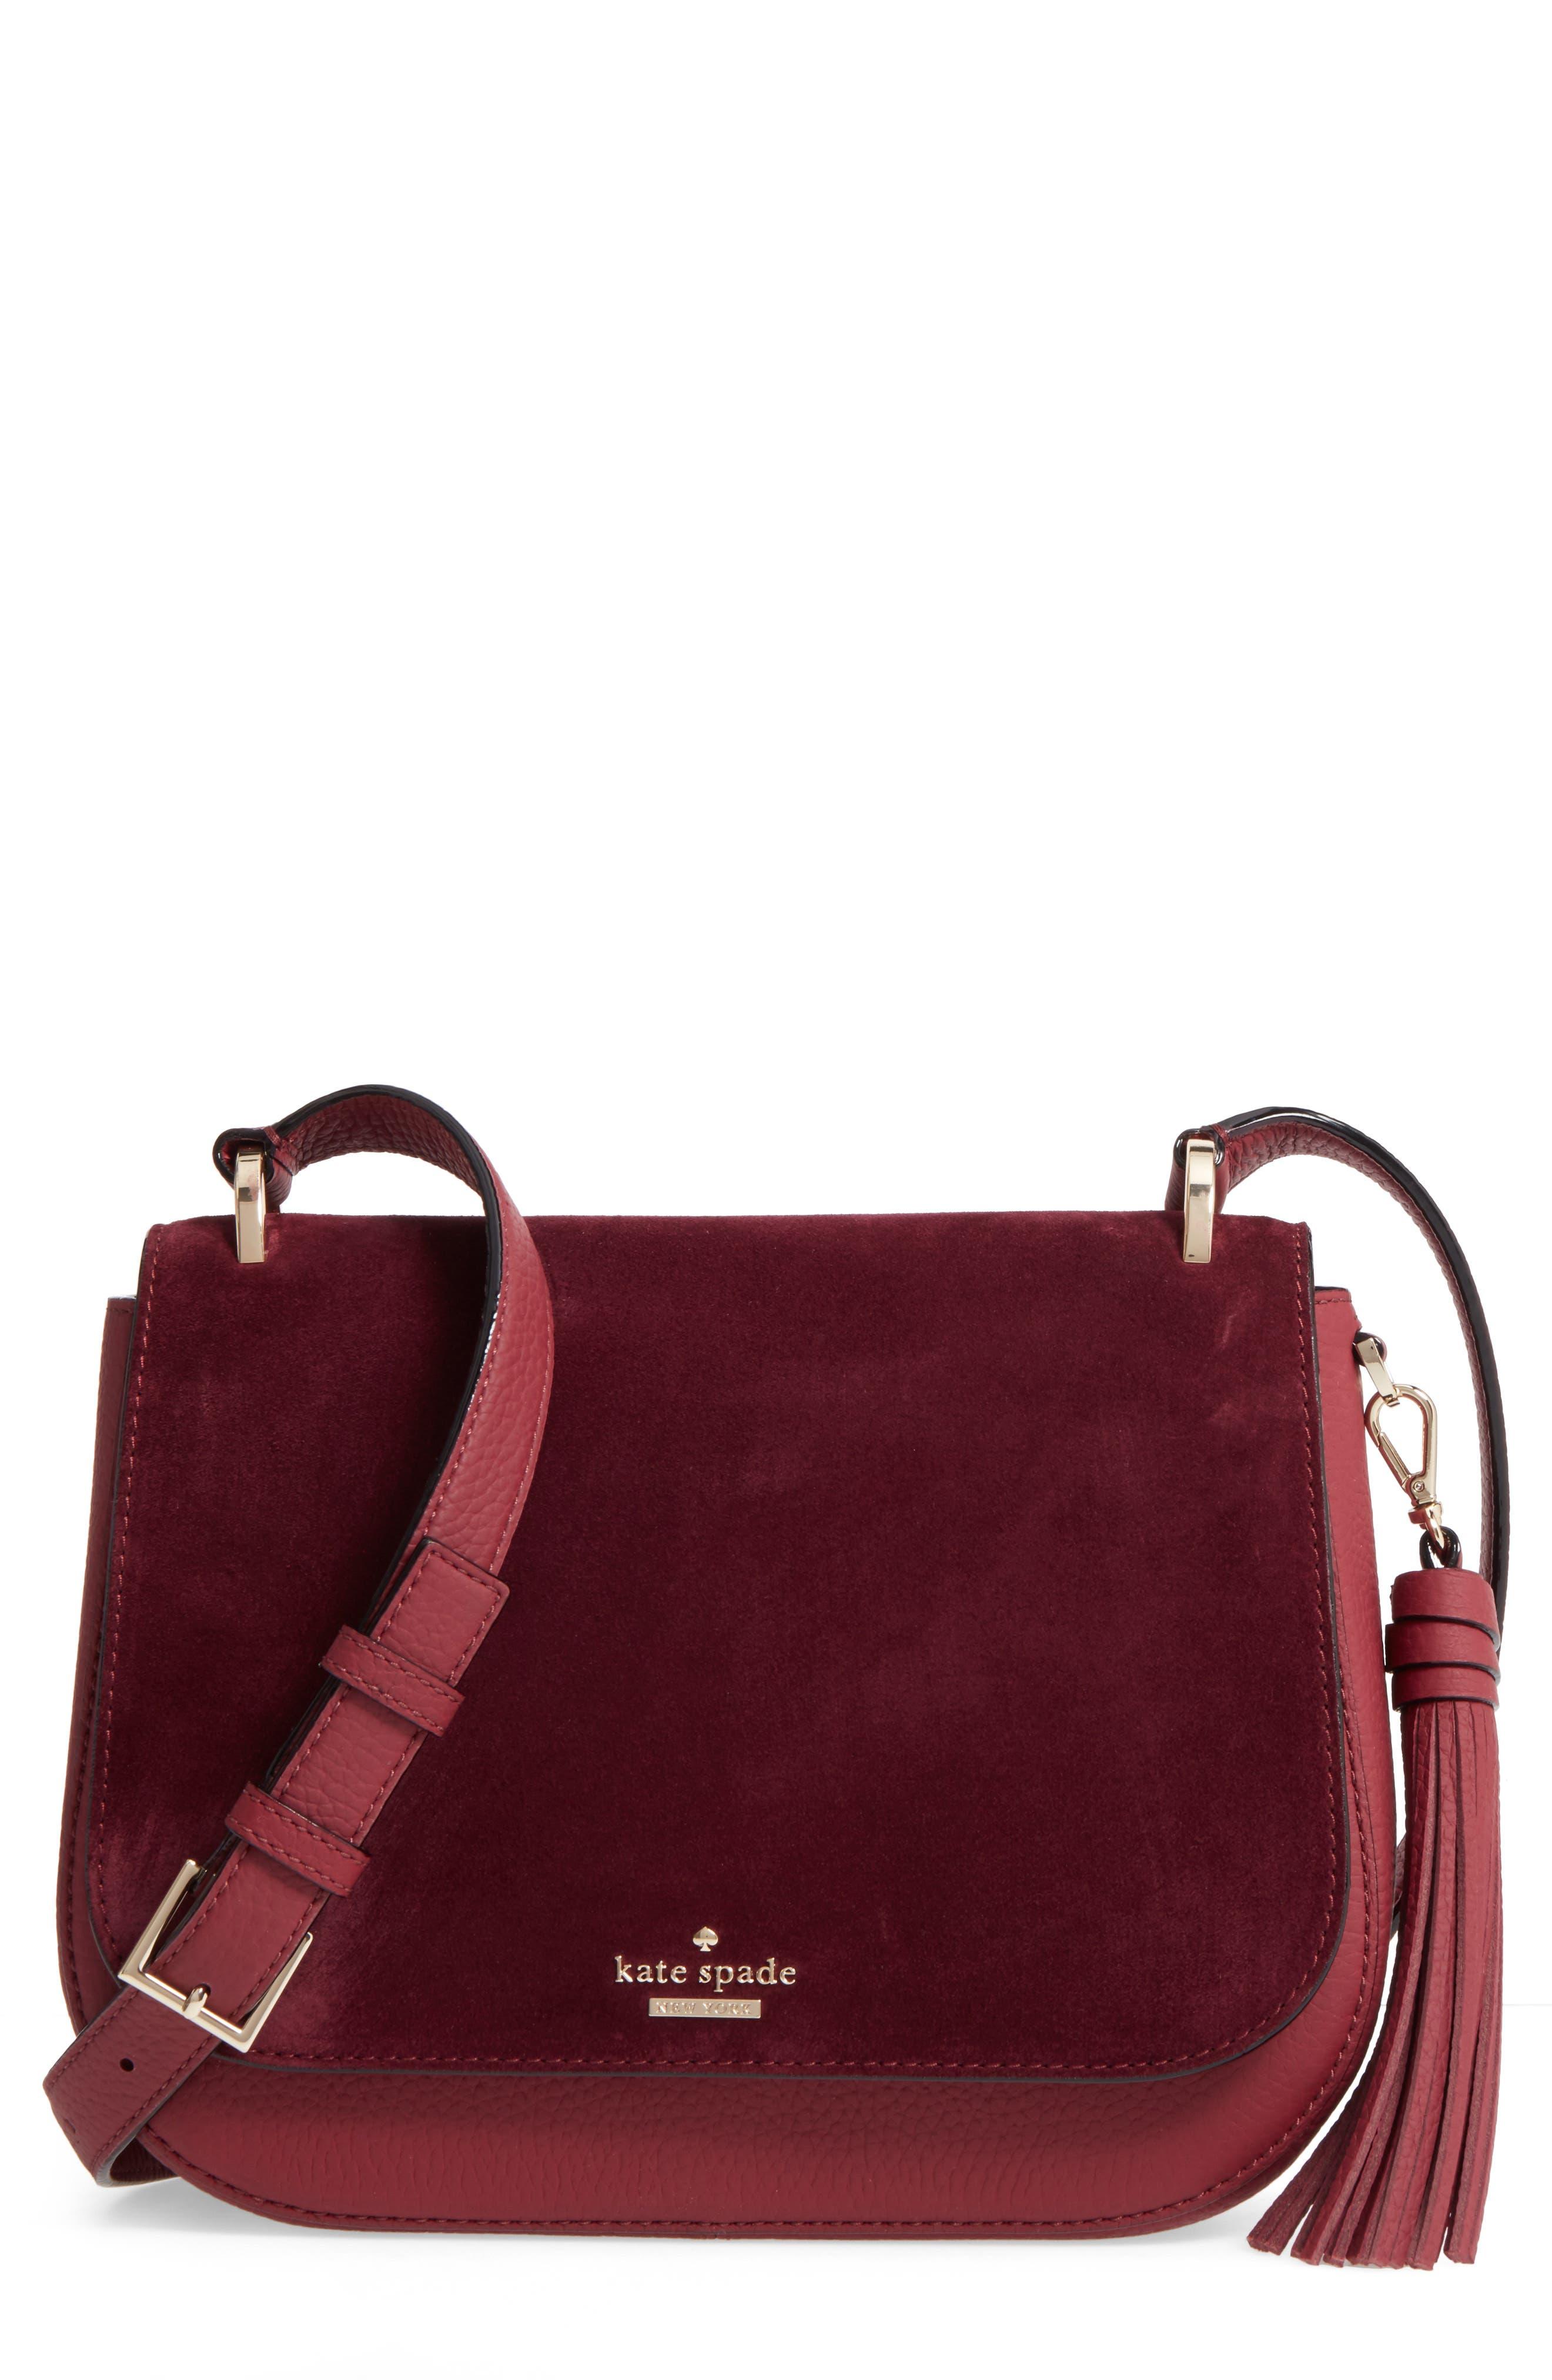 KATE SPADE NEW YORK daniels drive - tressa suede & leather shoulder/crossbody bag